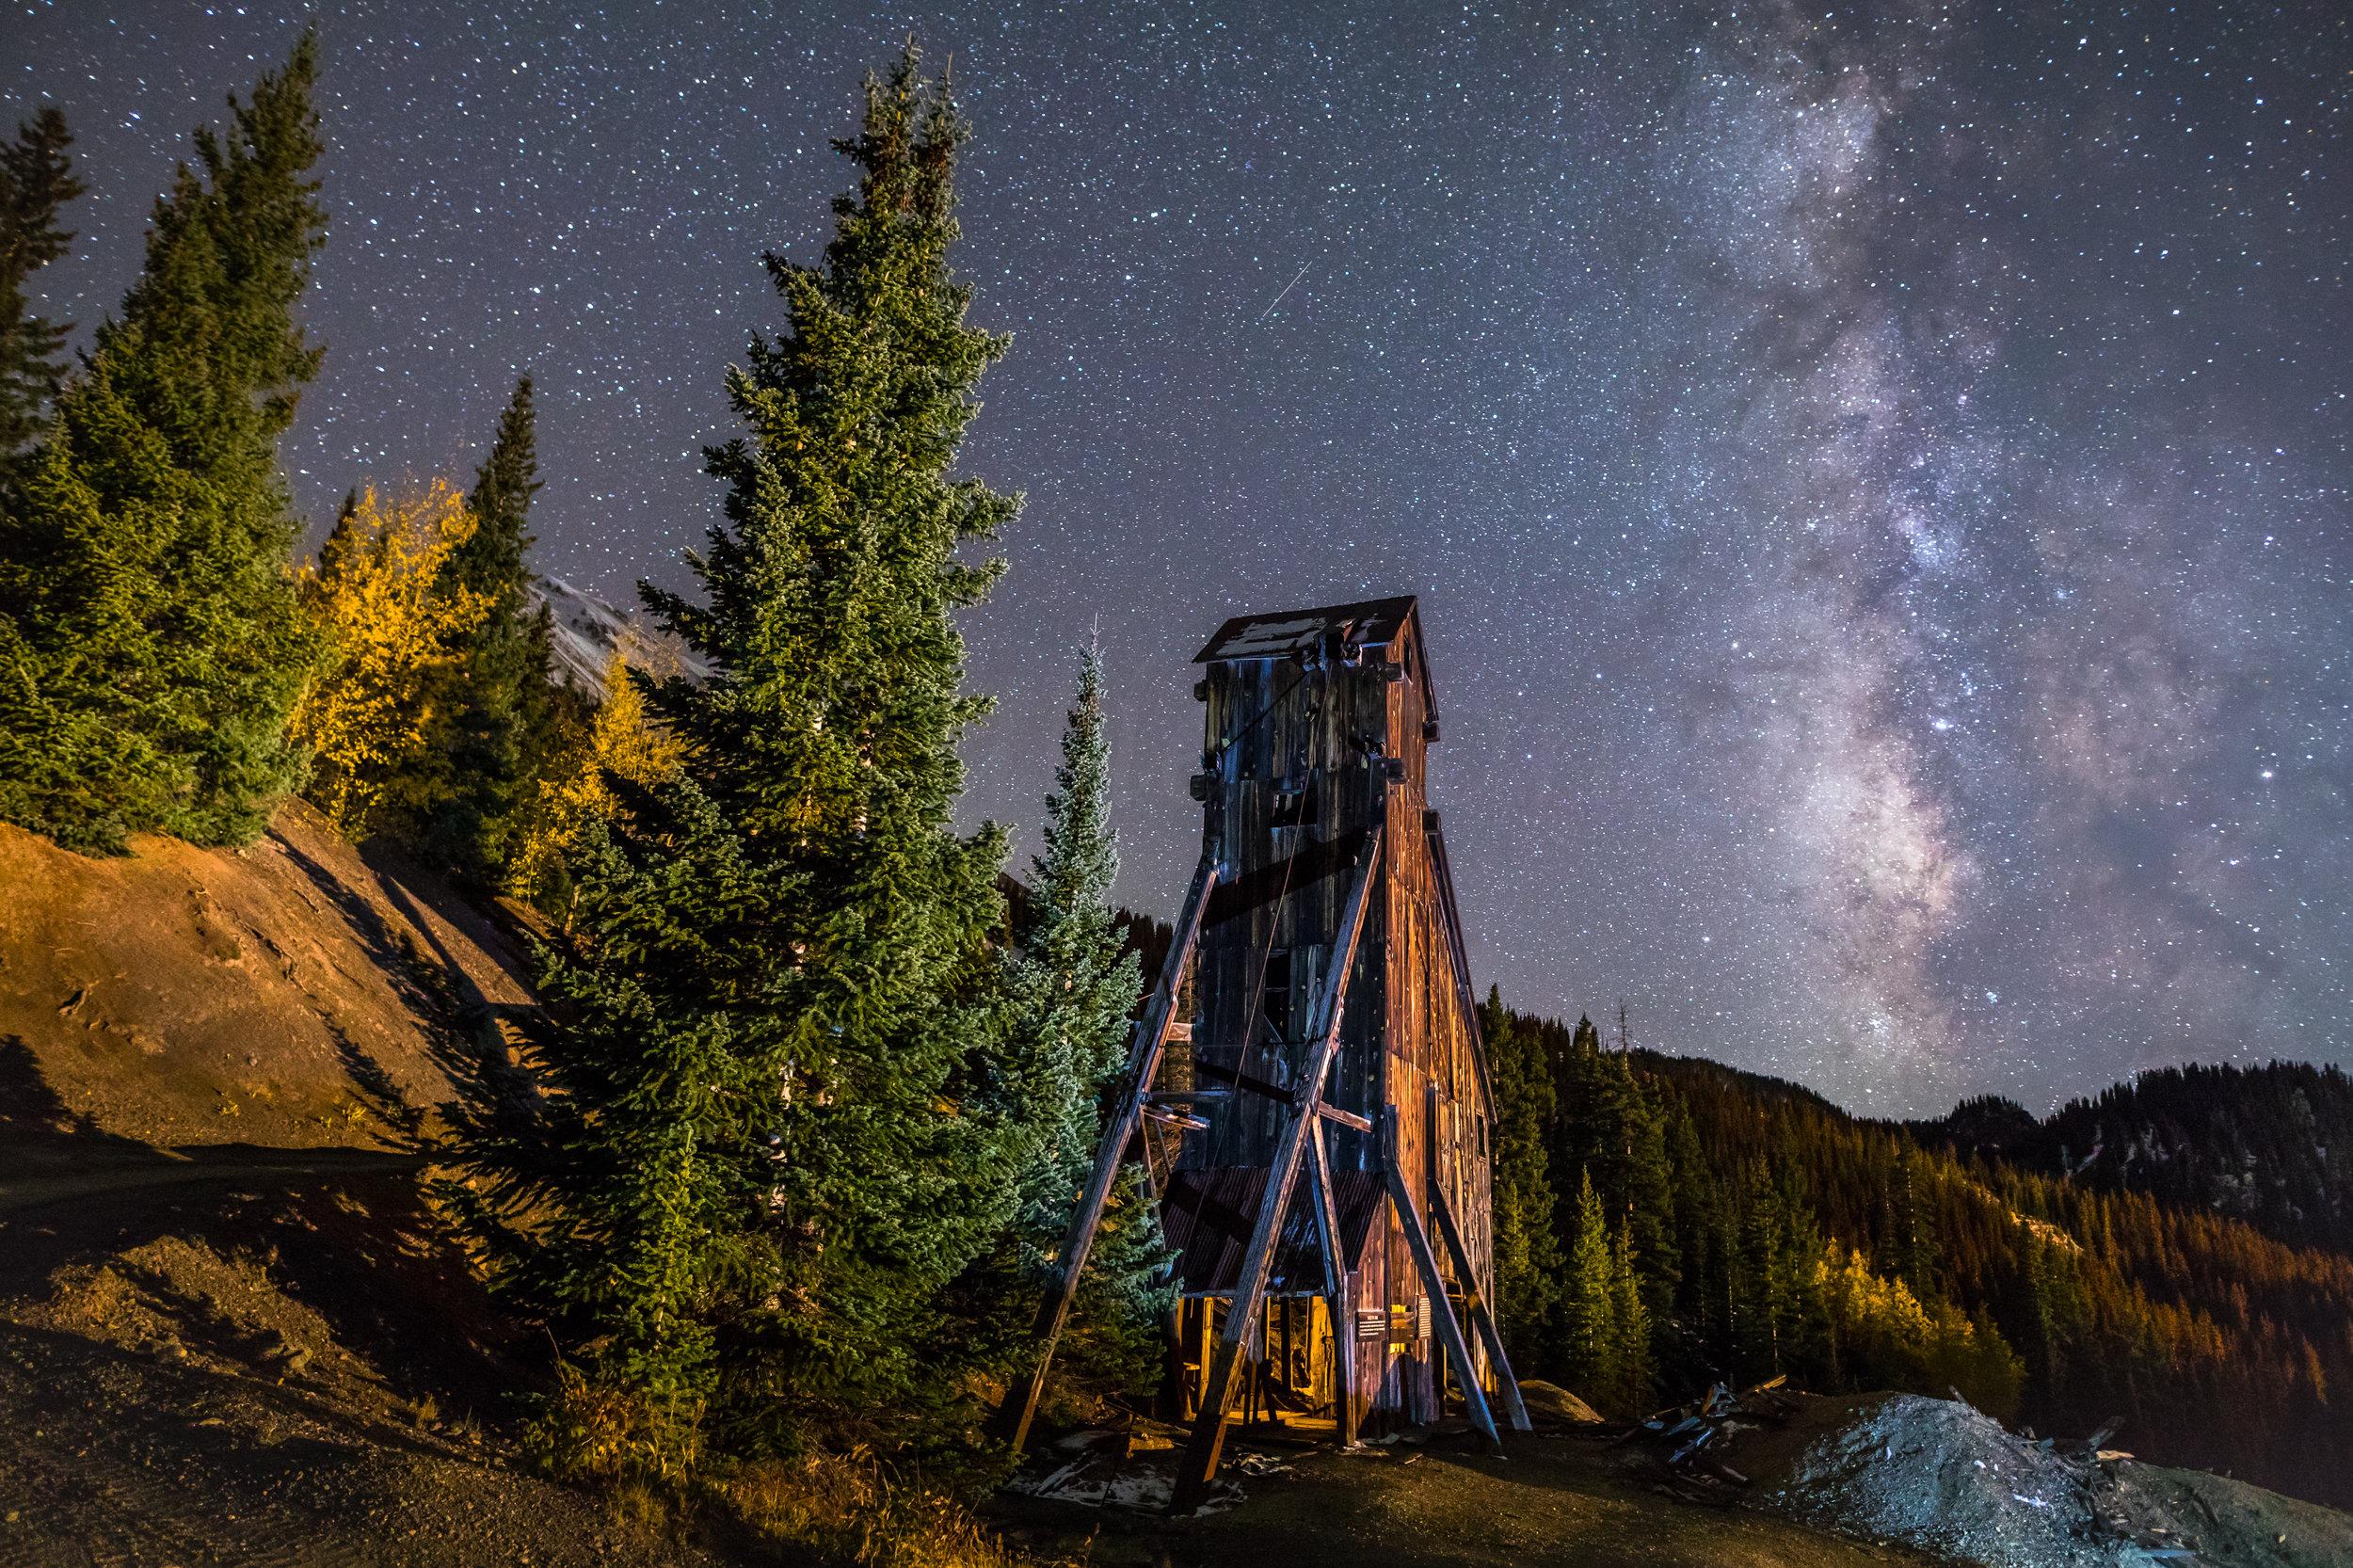 Milky way over Yankee Girl Mine, Image # 5514